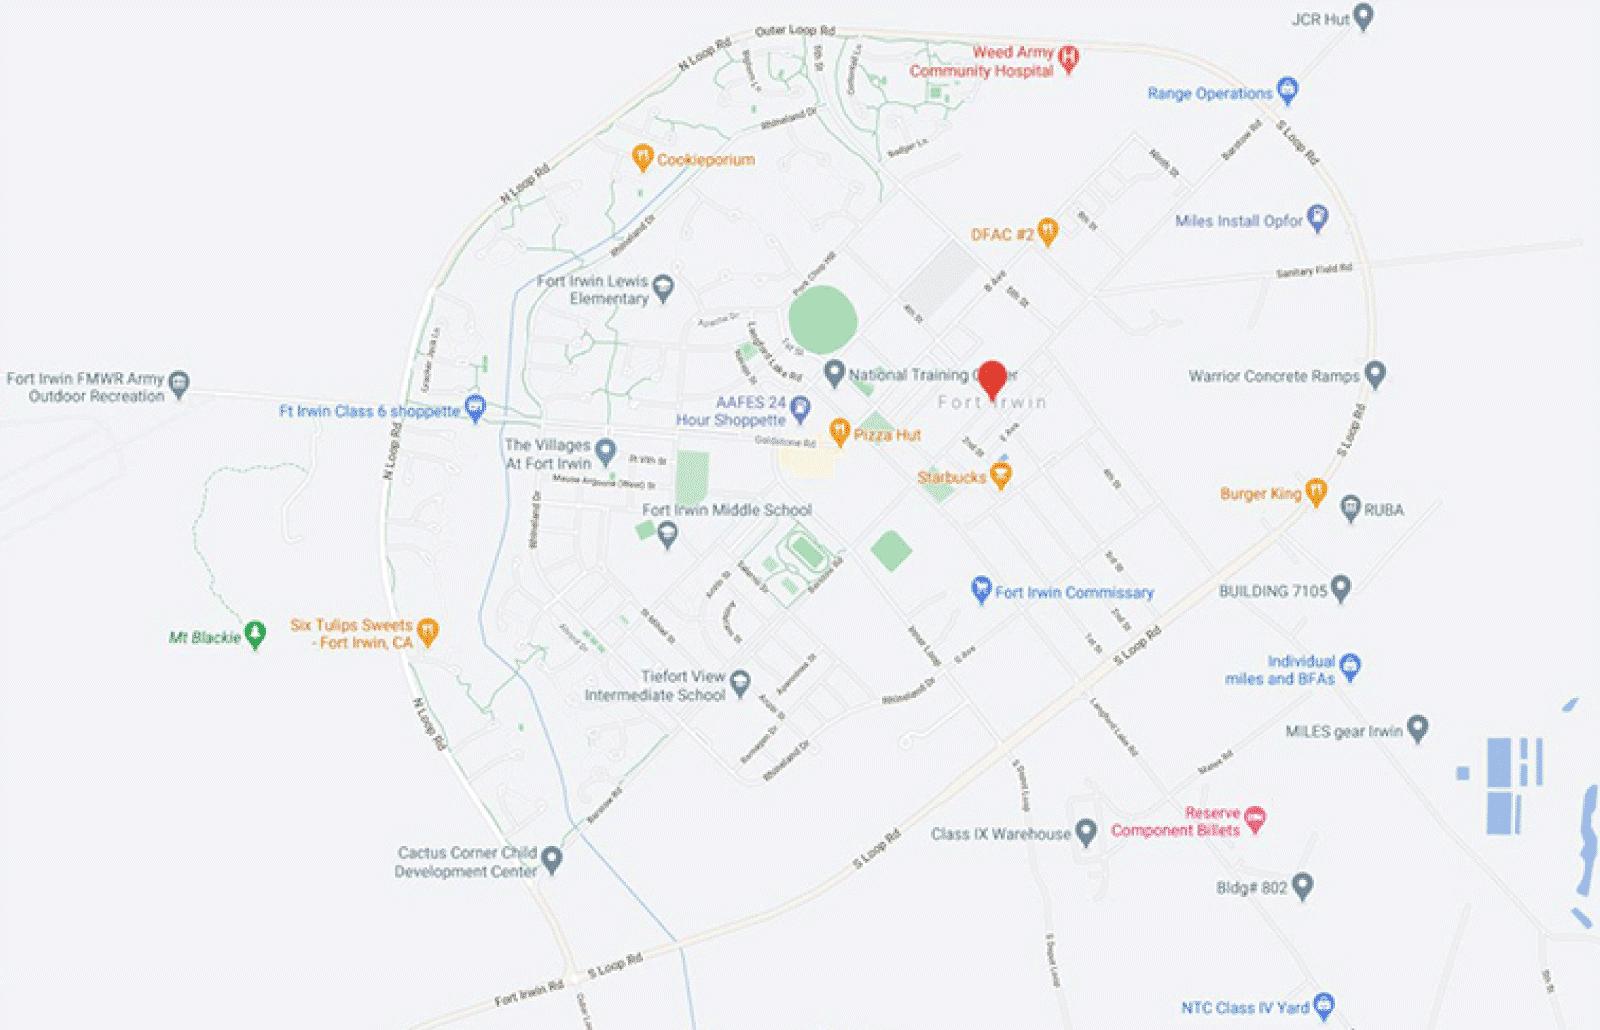 Fort Irwin Map